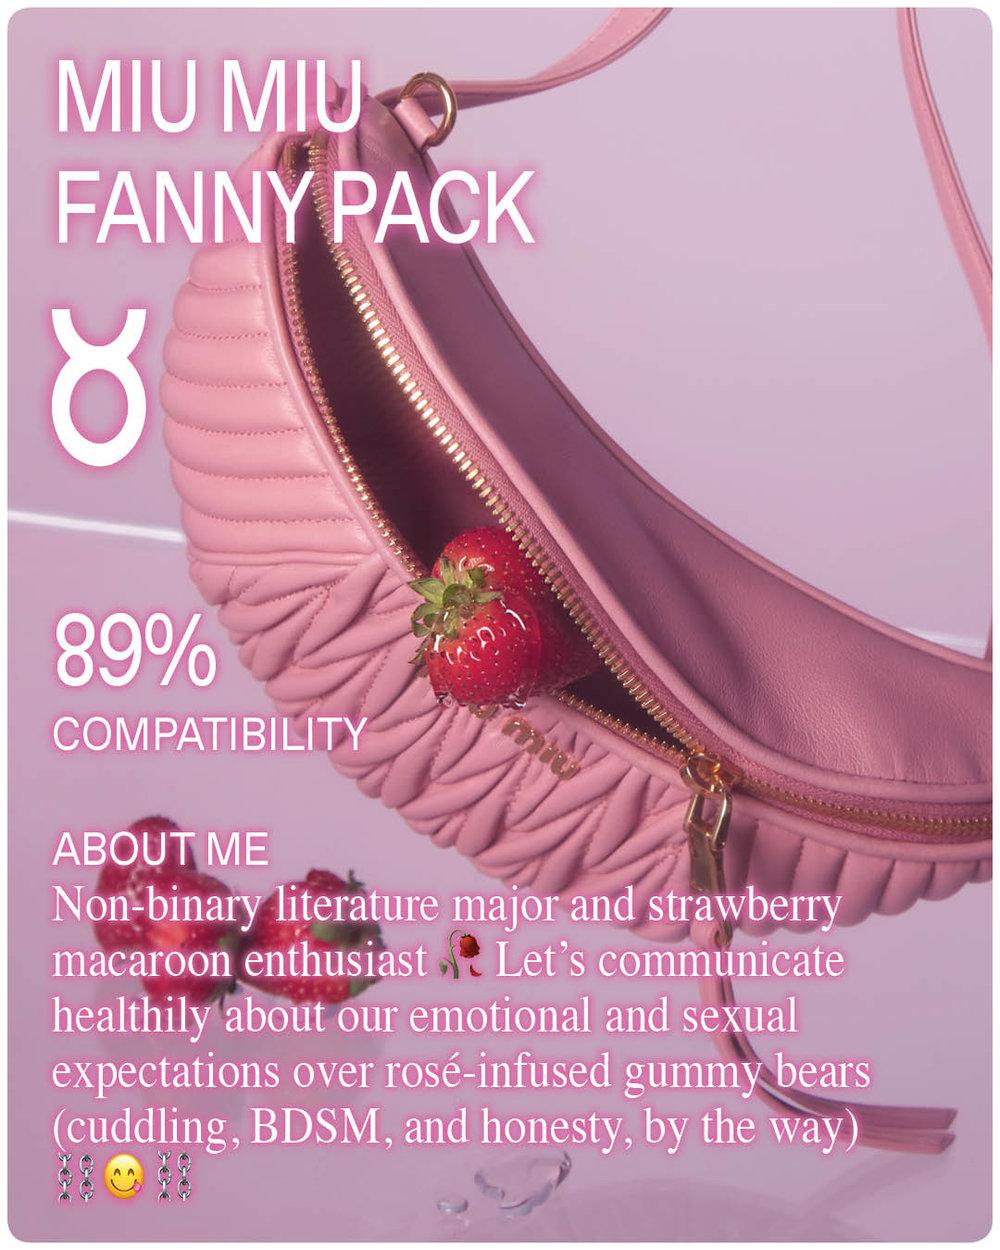 Pink Miu Miu Bag on Pink Background